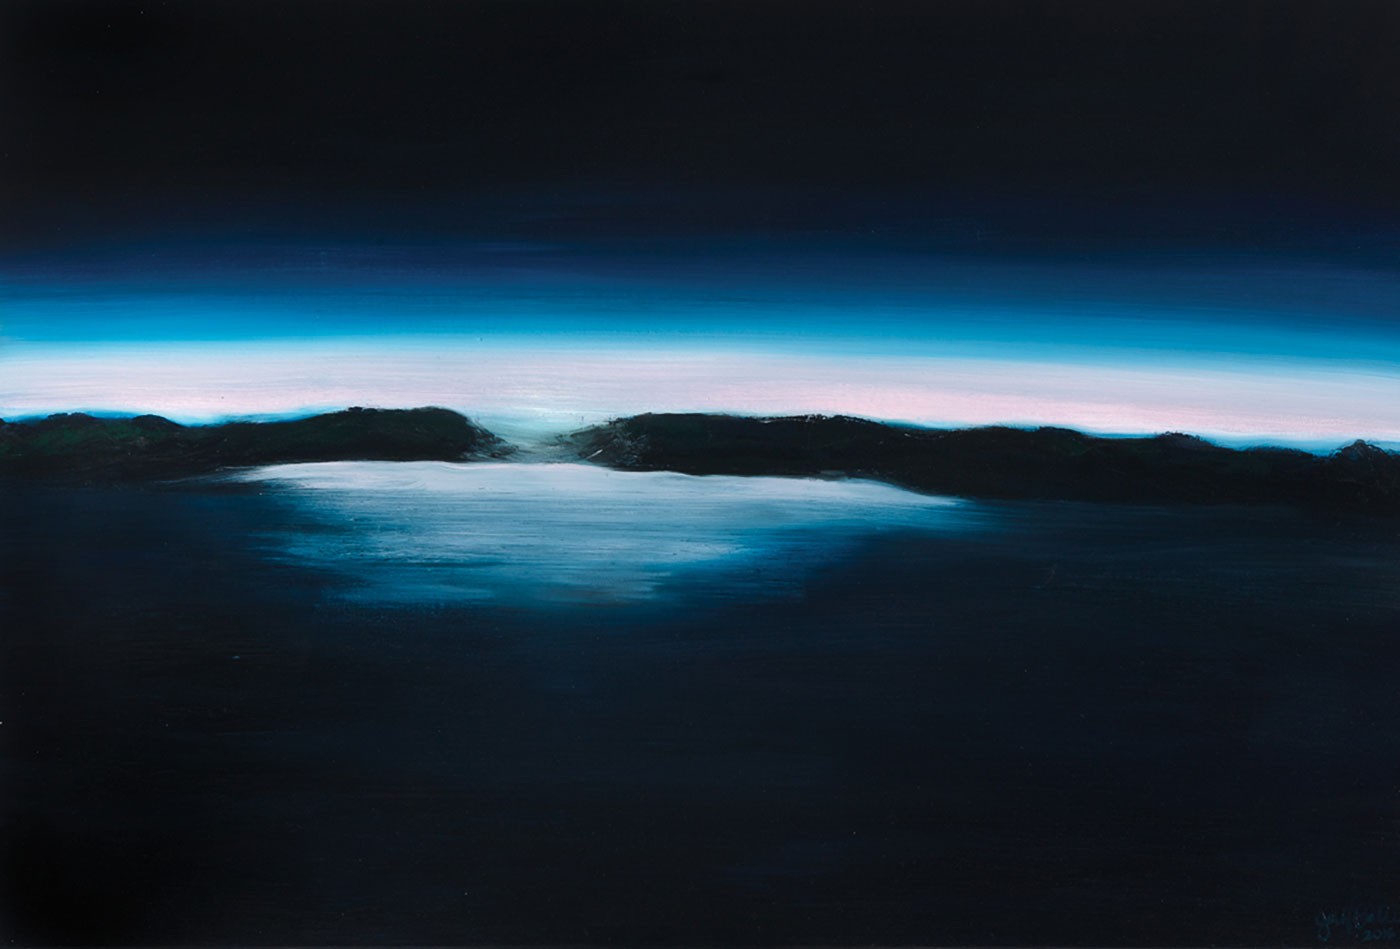 Jessica M. Balli - White Rock Lake Nocturnal West